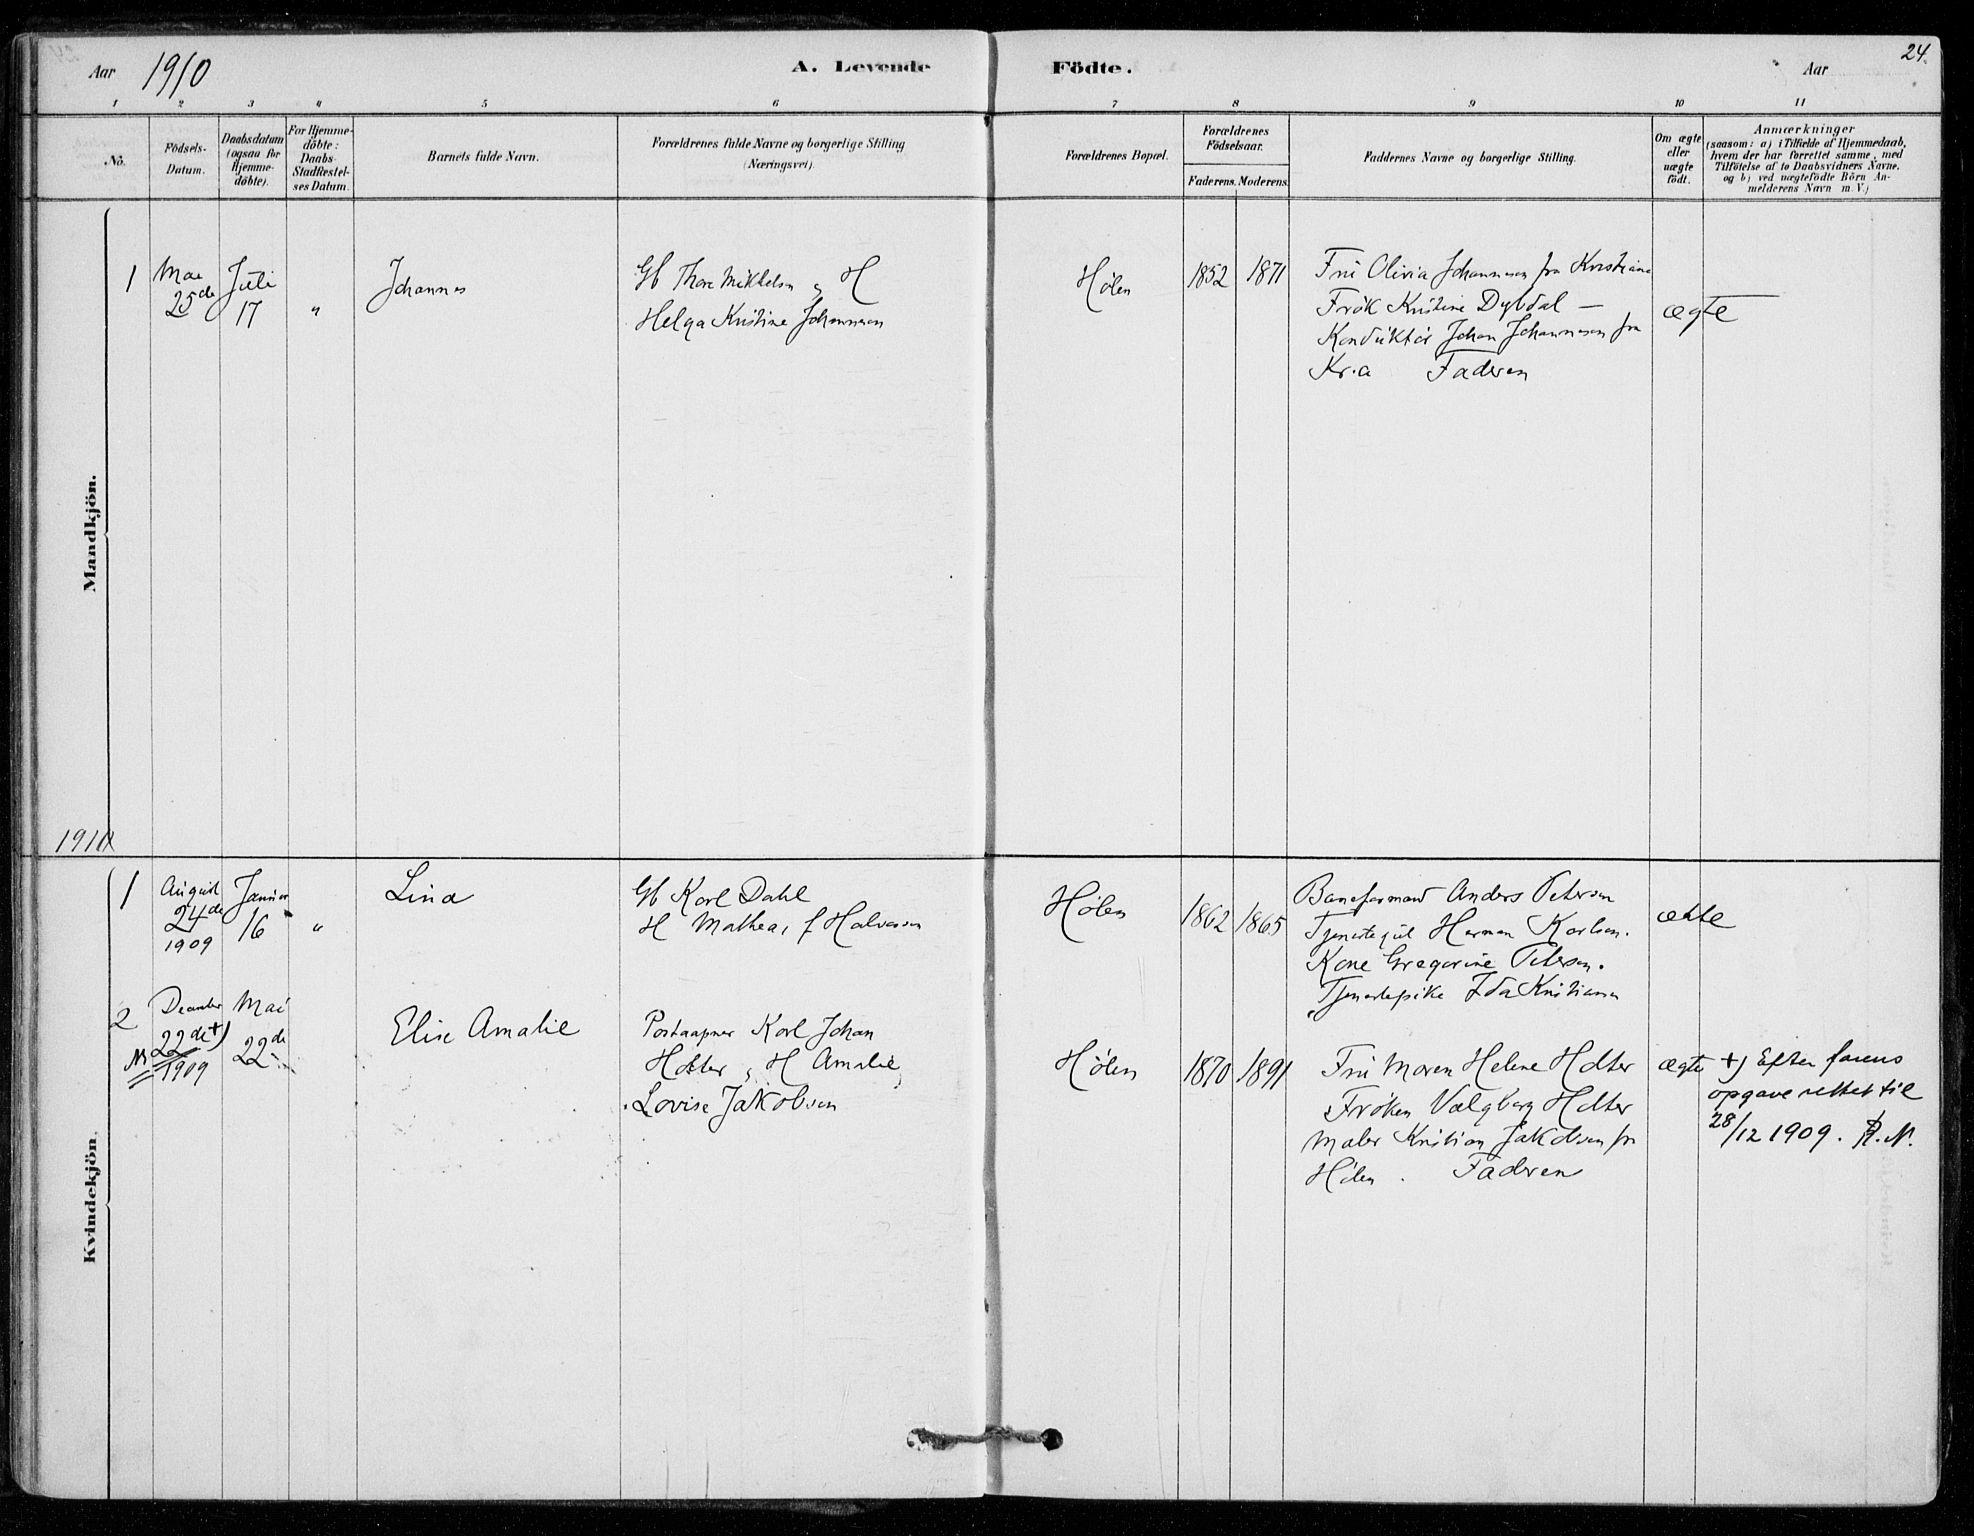 SAO, Vestby prestekontor Kirkebøker, F/Fe/L0001: Ministerialbok nr. V 1, 1878-1931, s. 24